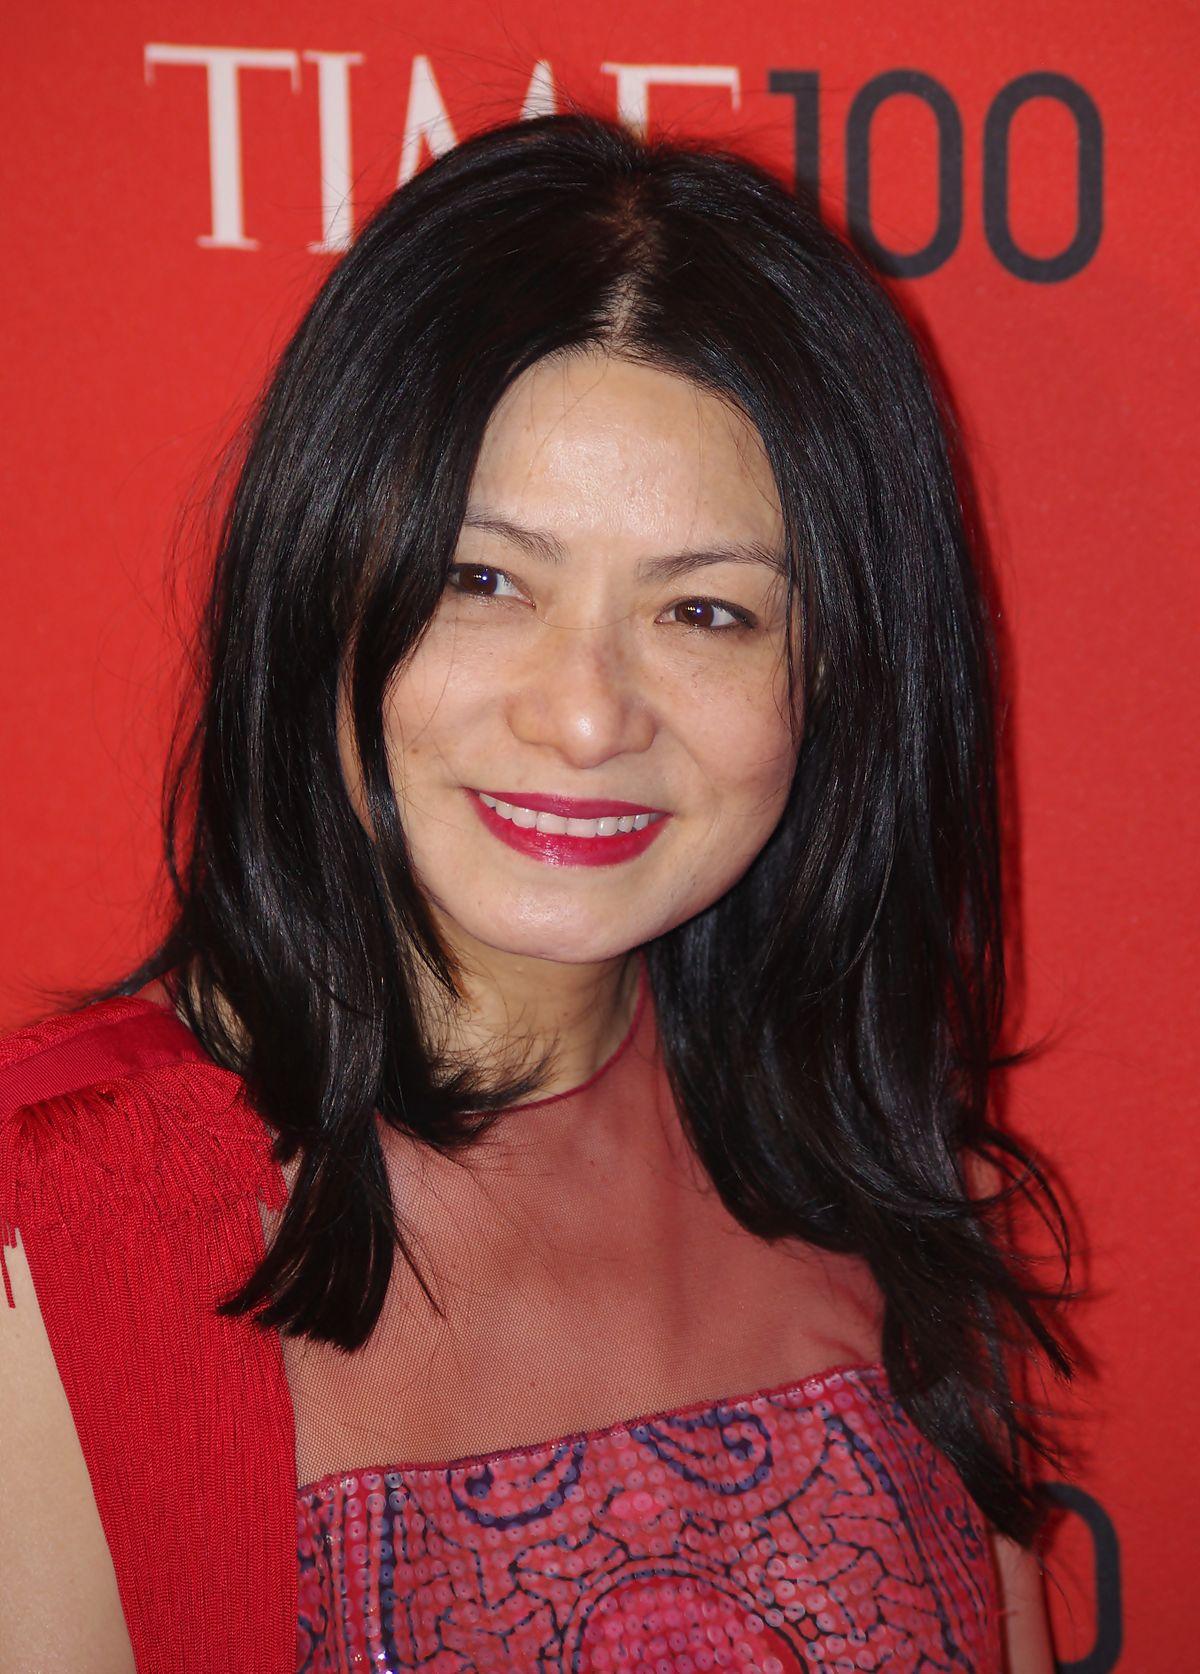 Vivienne Tam - Wikipedia